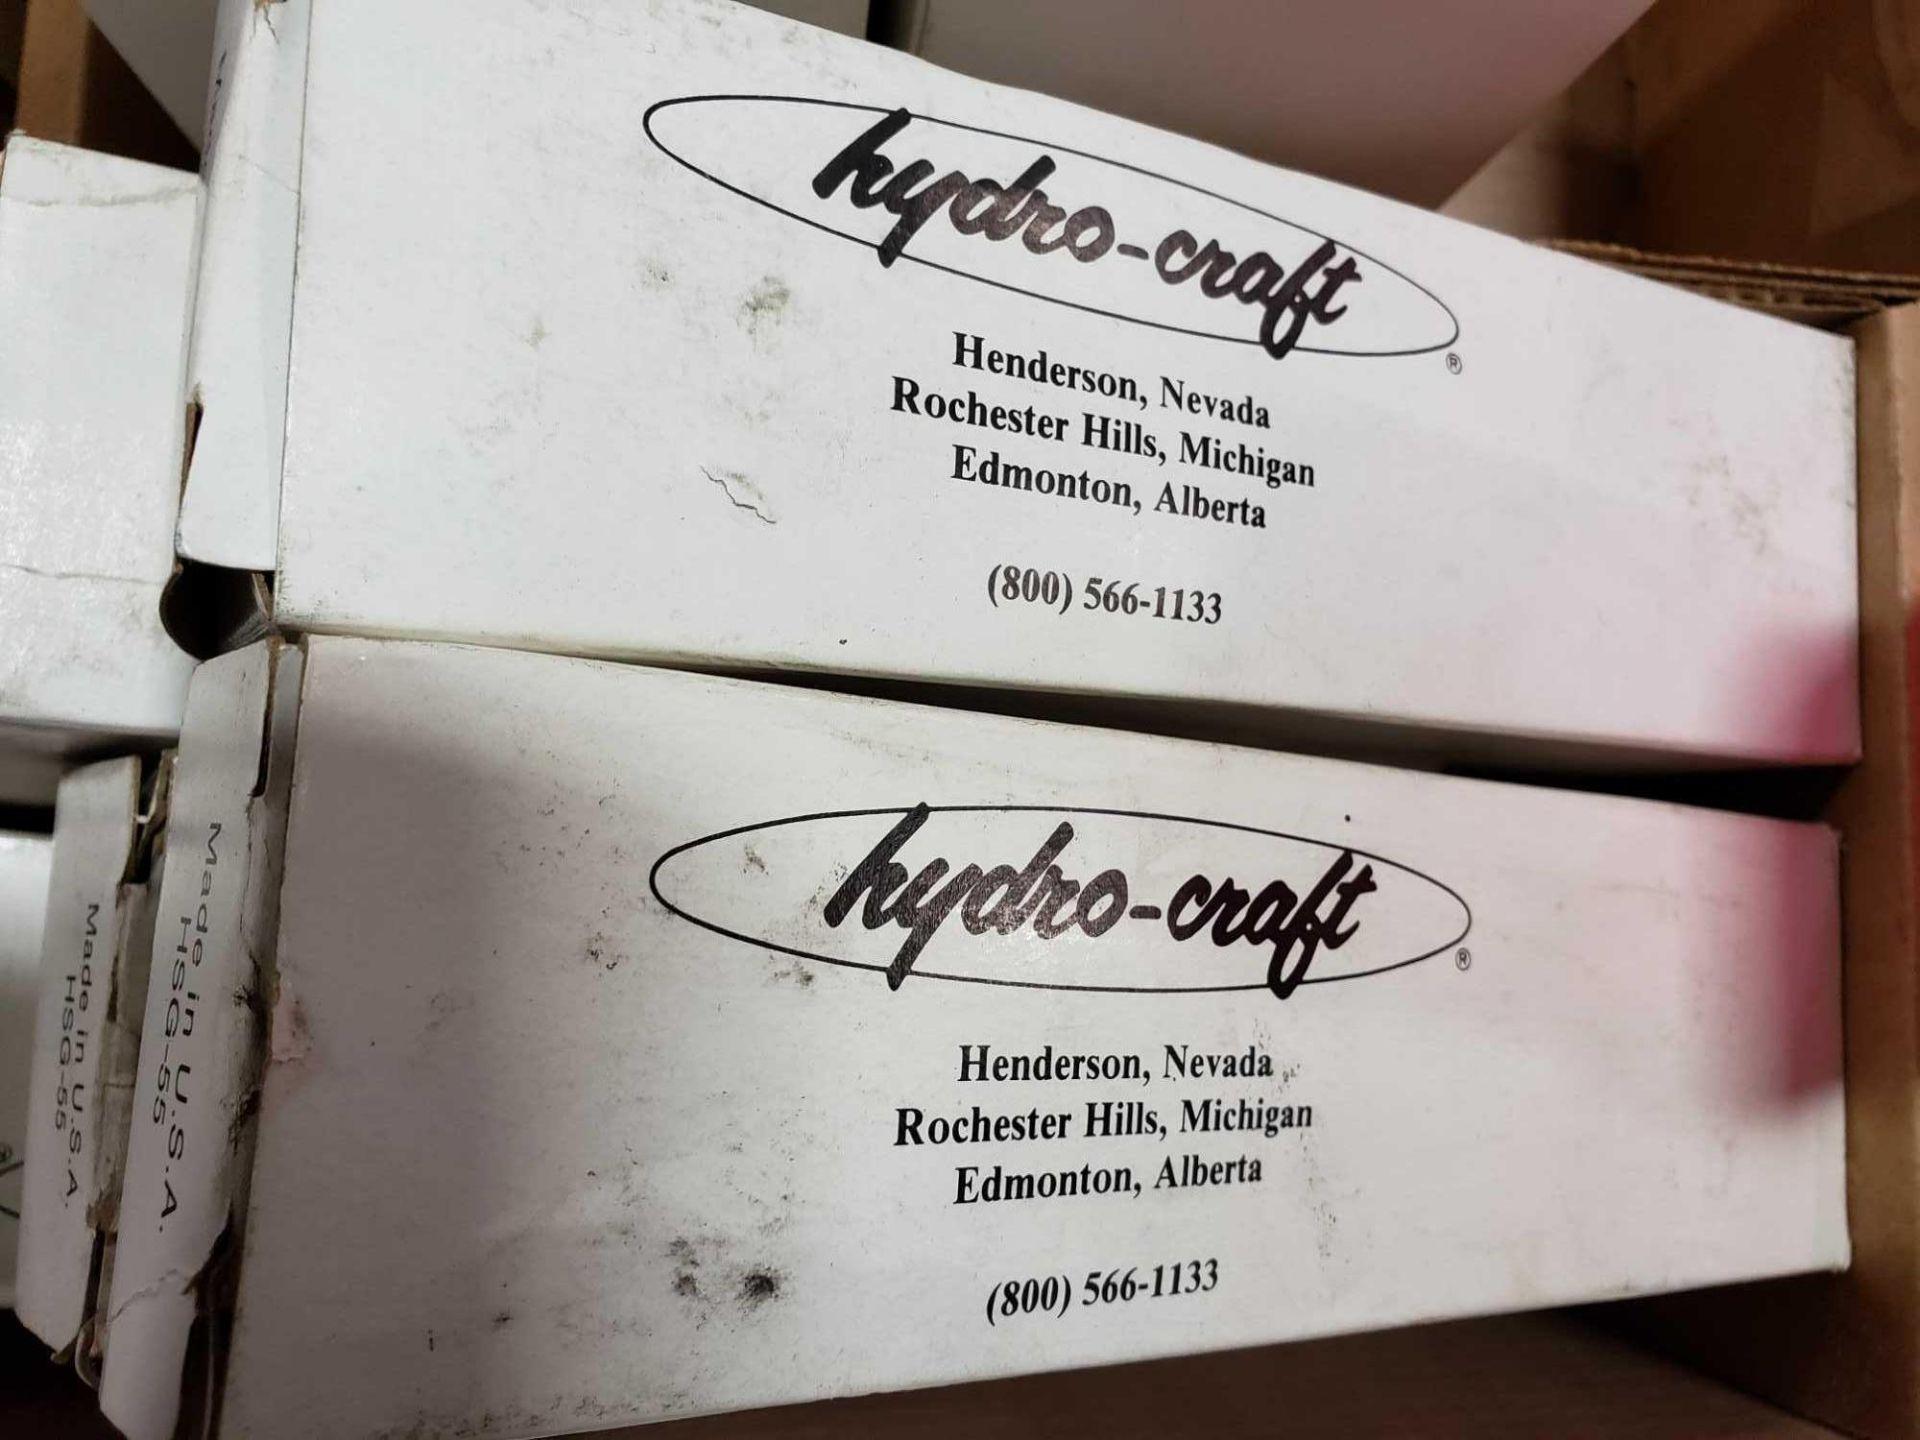 Lot 42 - Qty 6 - Hydro-craft model HSG-55. New in box.